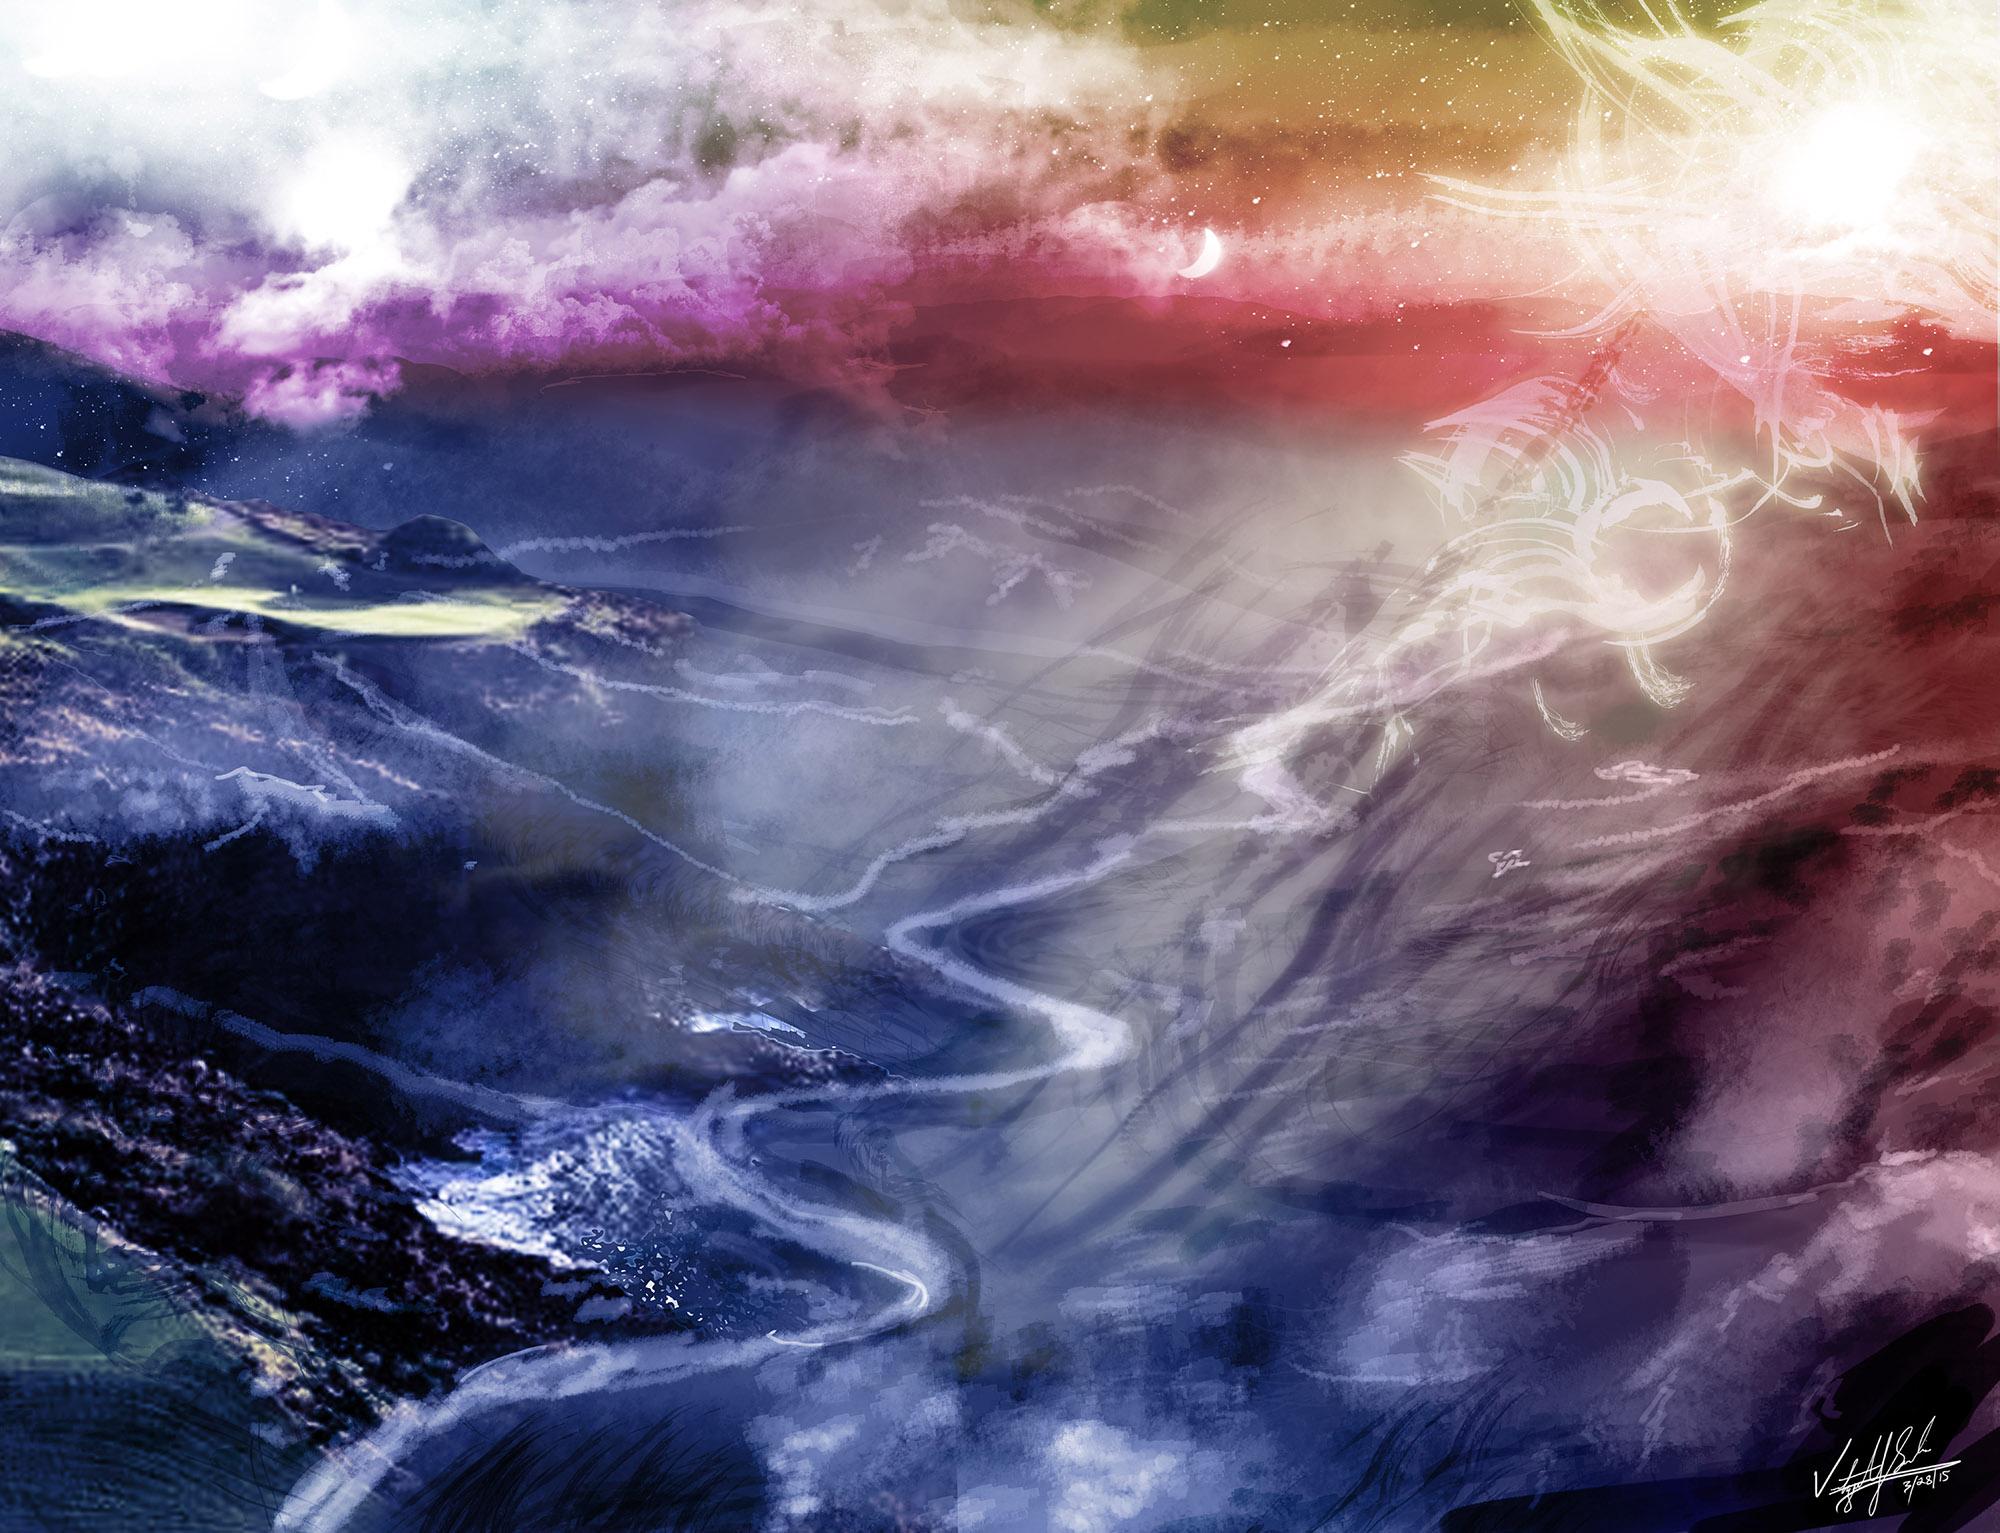 """Dreamscape"" - Digital painting"